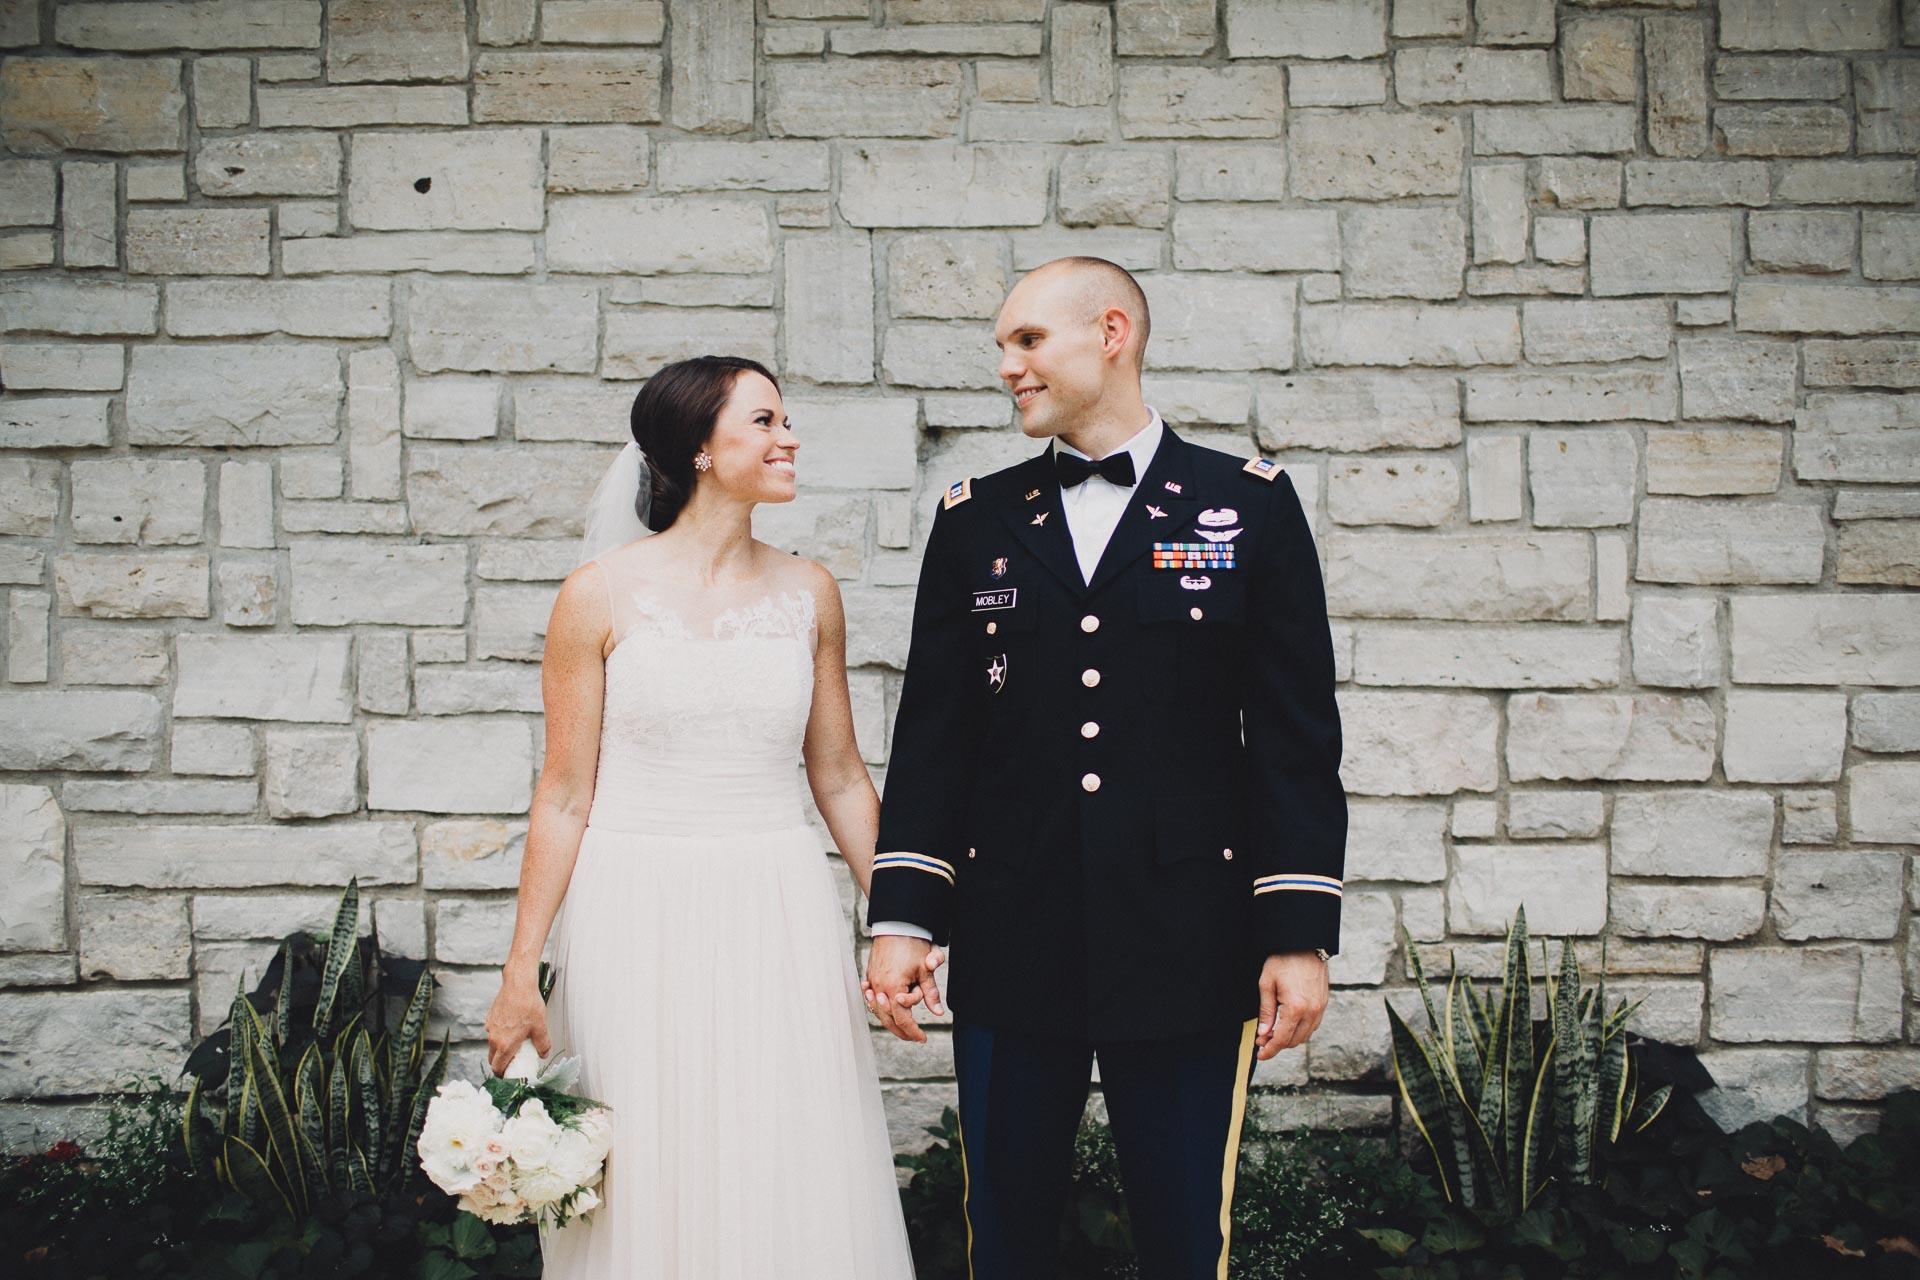 Emily-Eddie-Cincinnati-Rennaissance-Hotel-Wedding-054@2x.jpg